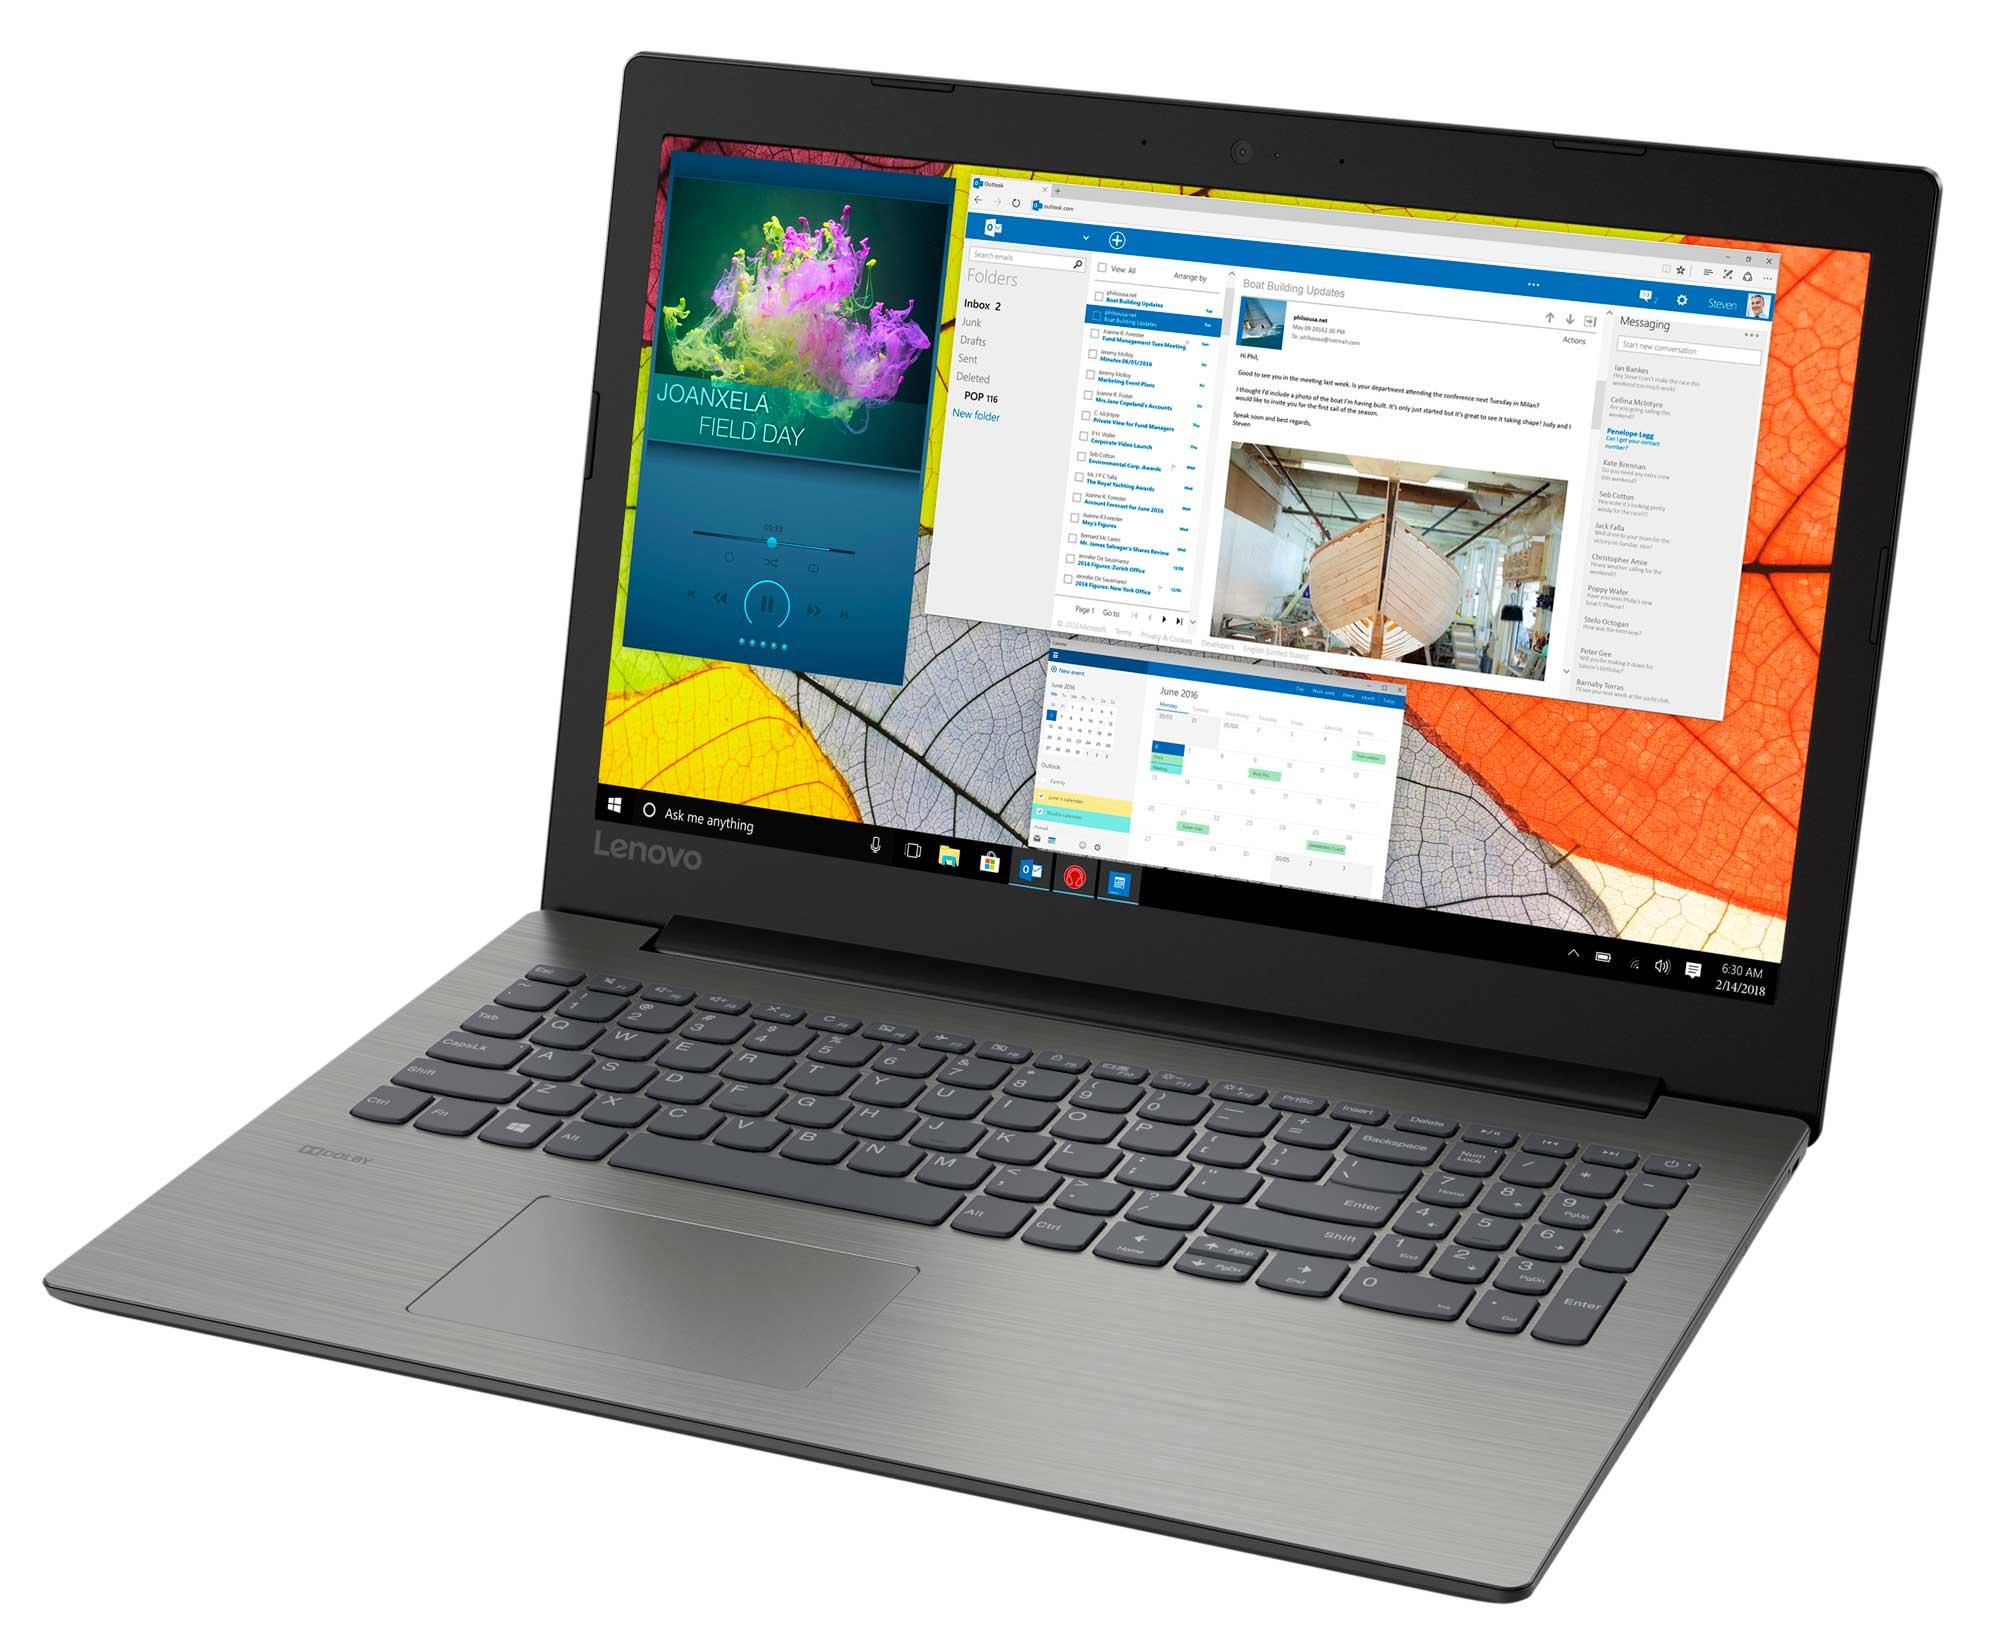 Notebook  Lenovo  Ideapad  Ideapad  330-15IKB  15.6 HD, i3 8130U, 4GB, 1TB, MX150 2GB, NO ODD, NO OS, onyx black